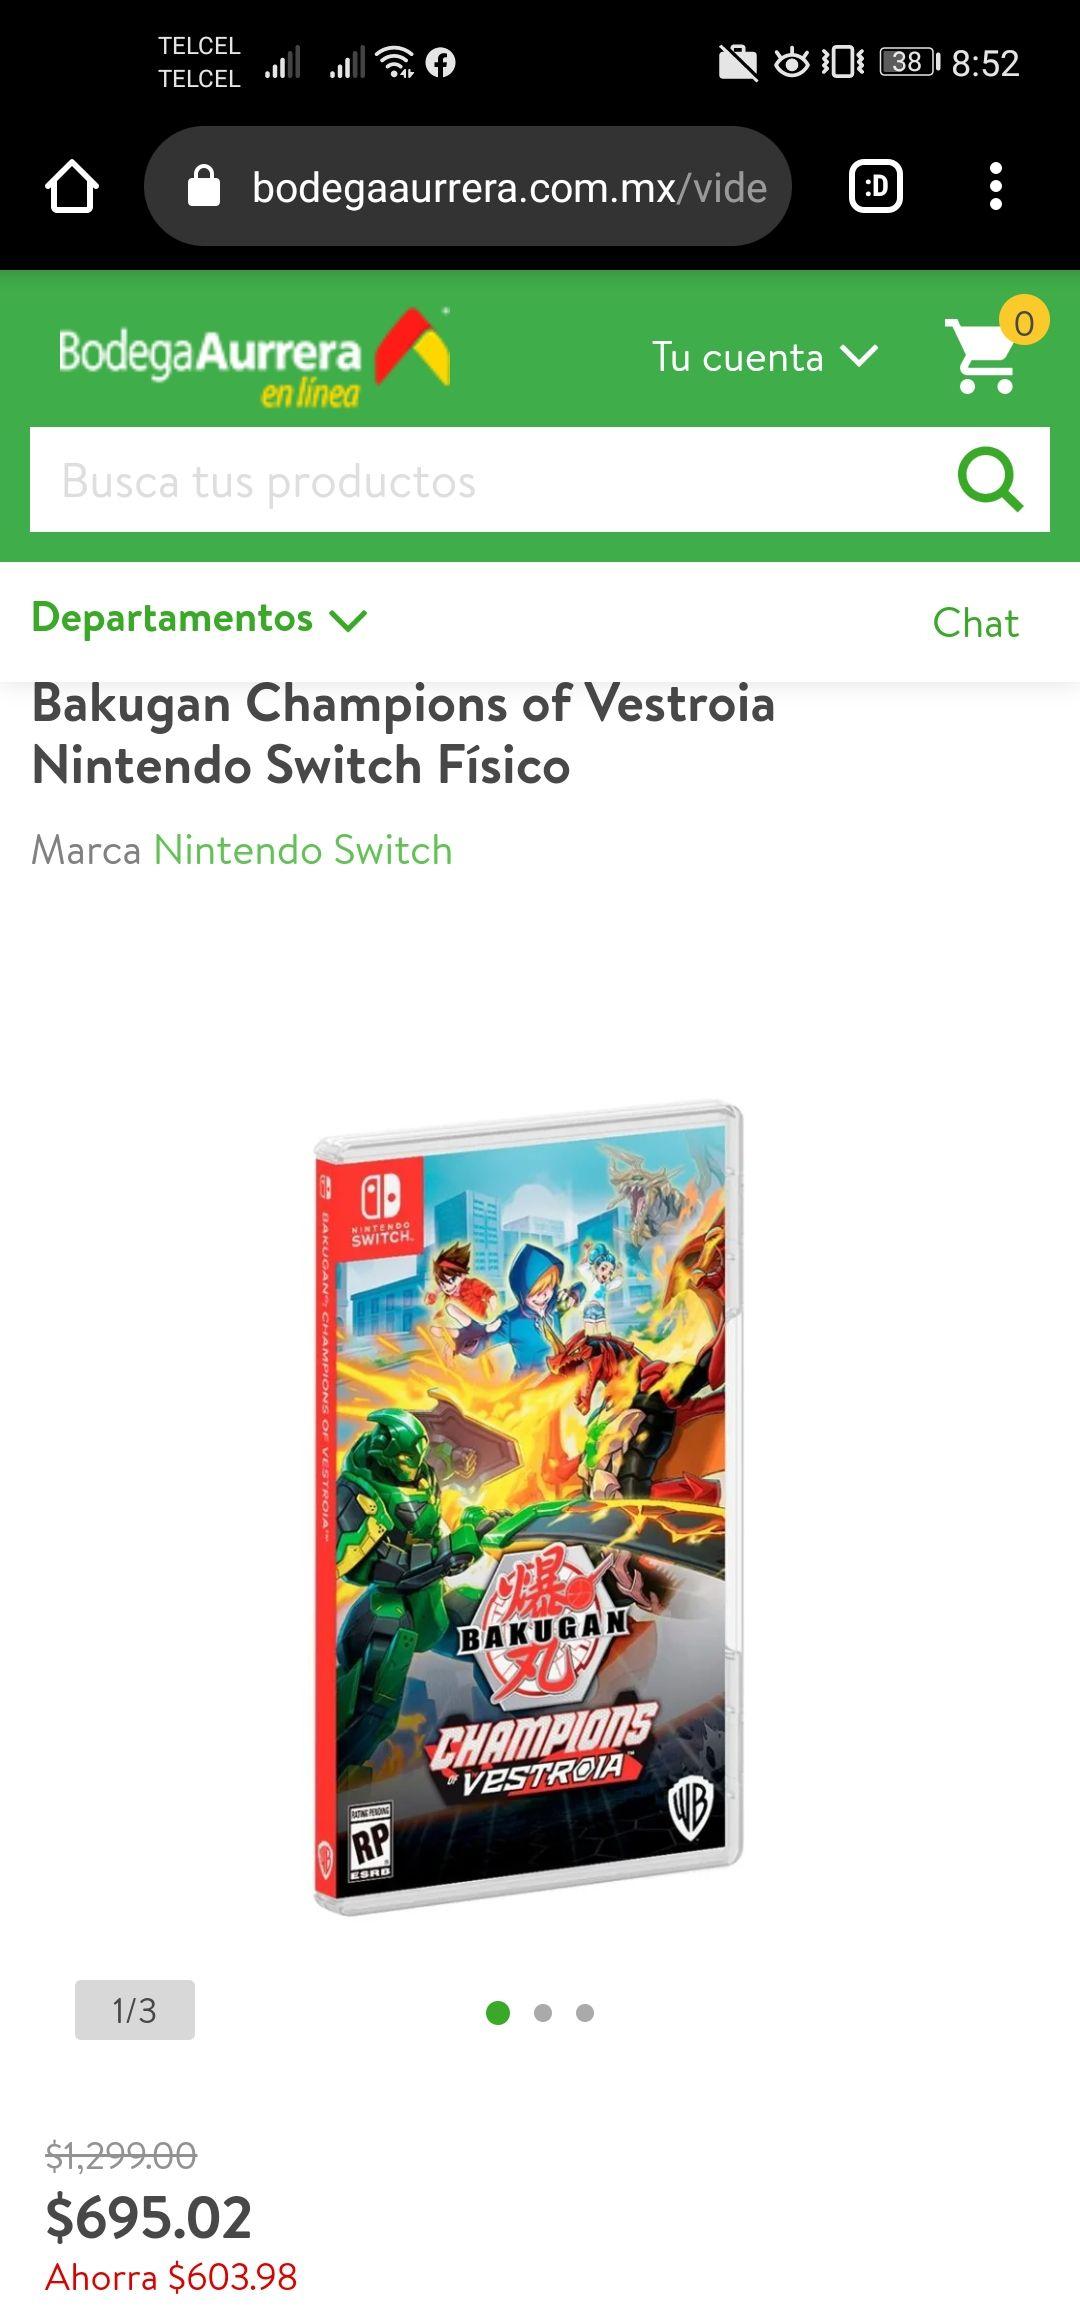 Bodega Aurrera: Bakugan Champions of Vestroia Nintendo Switch Físico